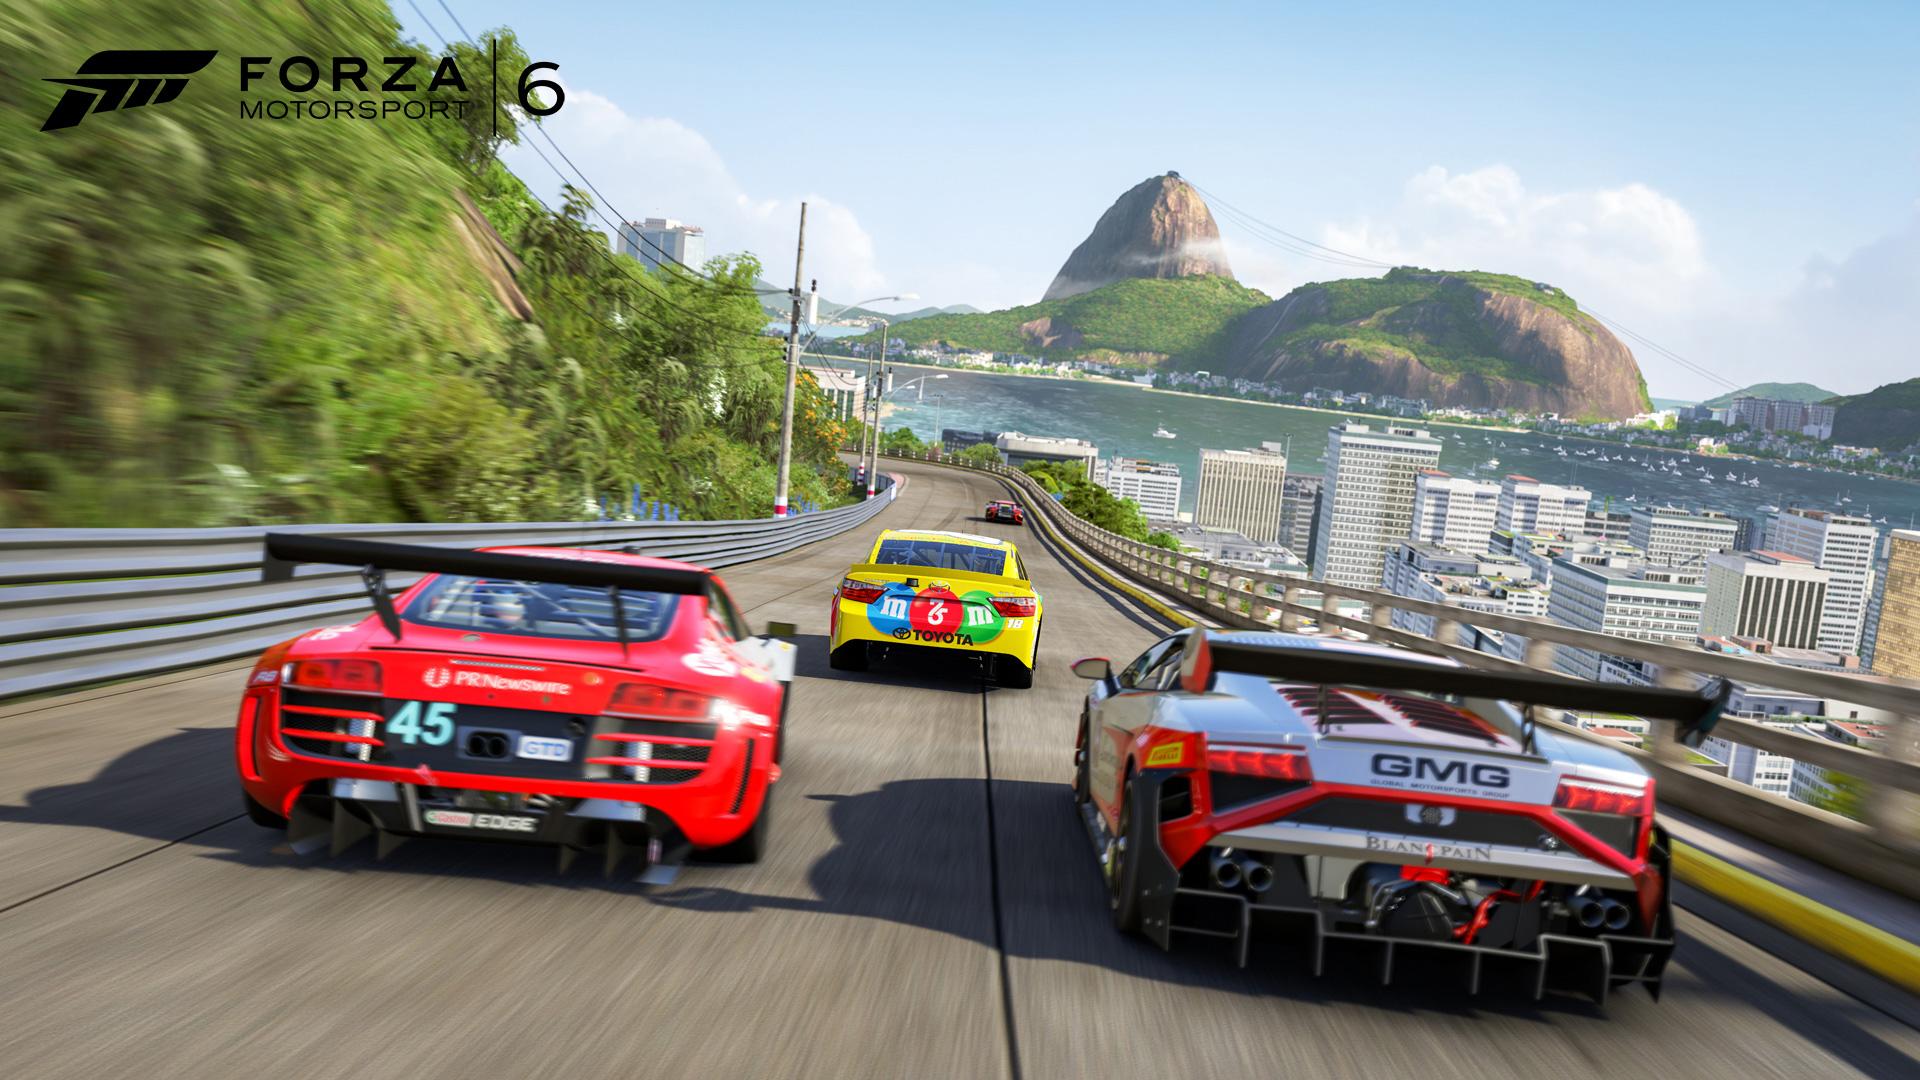 Forza Motorsport 6 screenshot showing Rio skyline